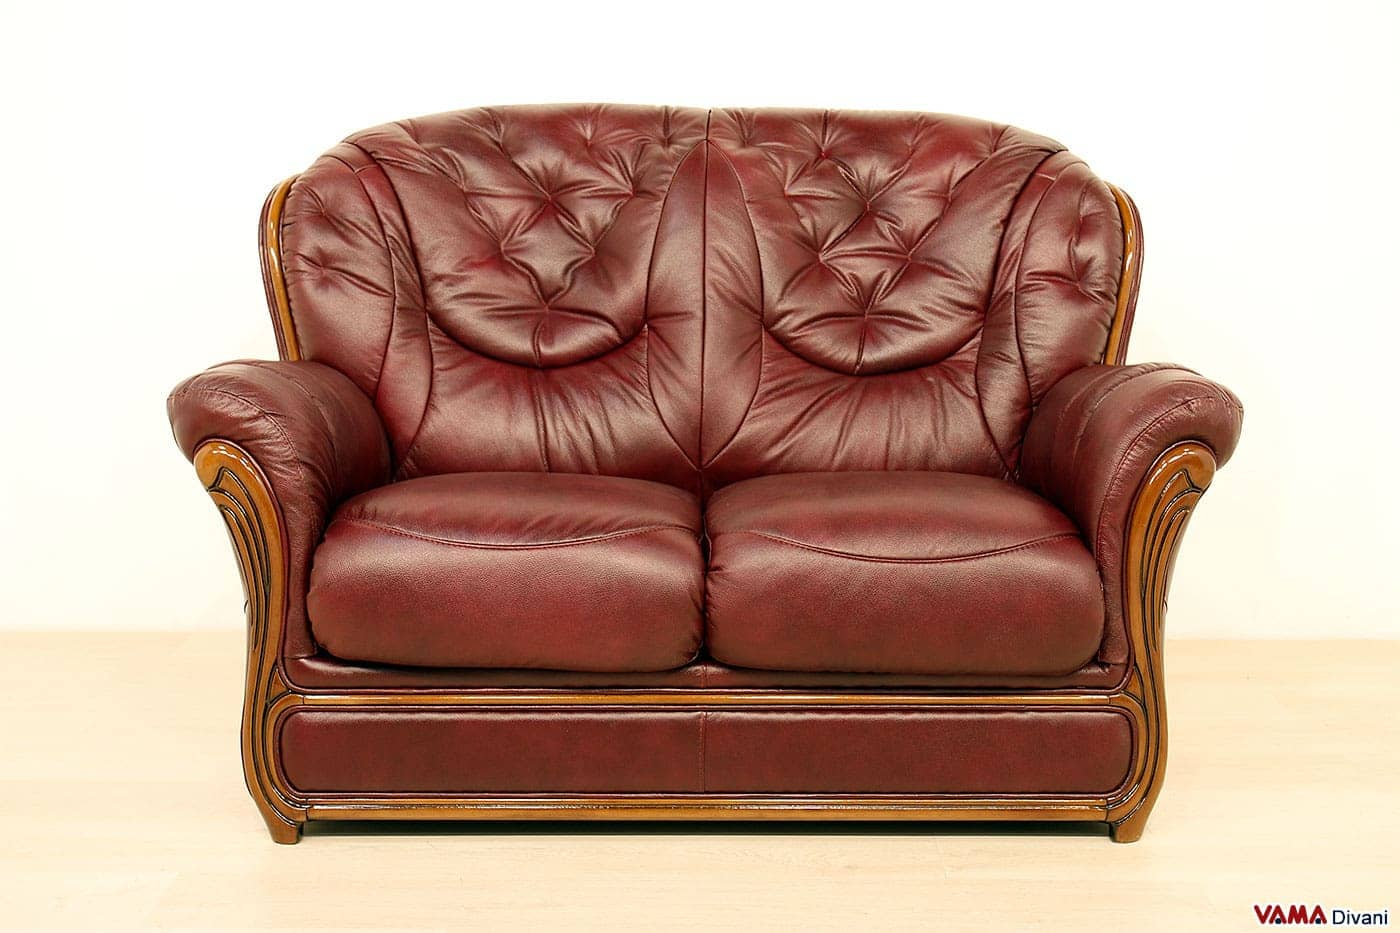 Offerta divano 2 posti vintage vama divani - Dimensioni divano 2 posti ...